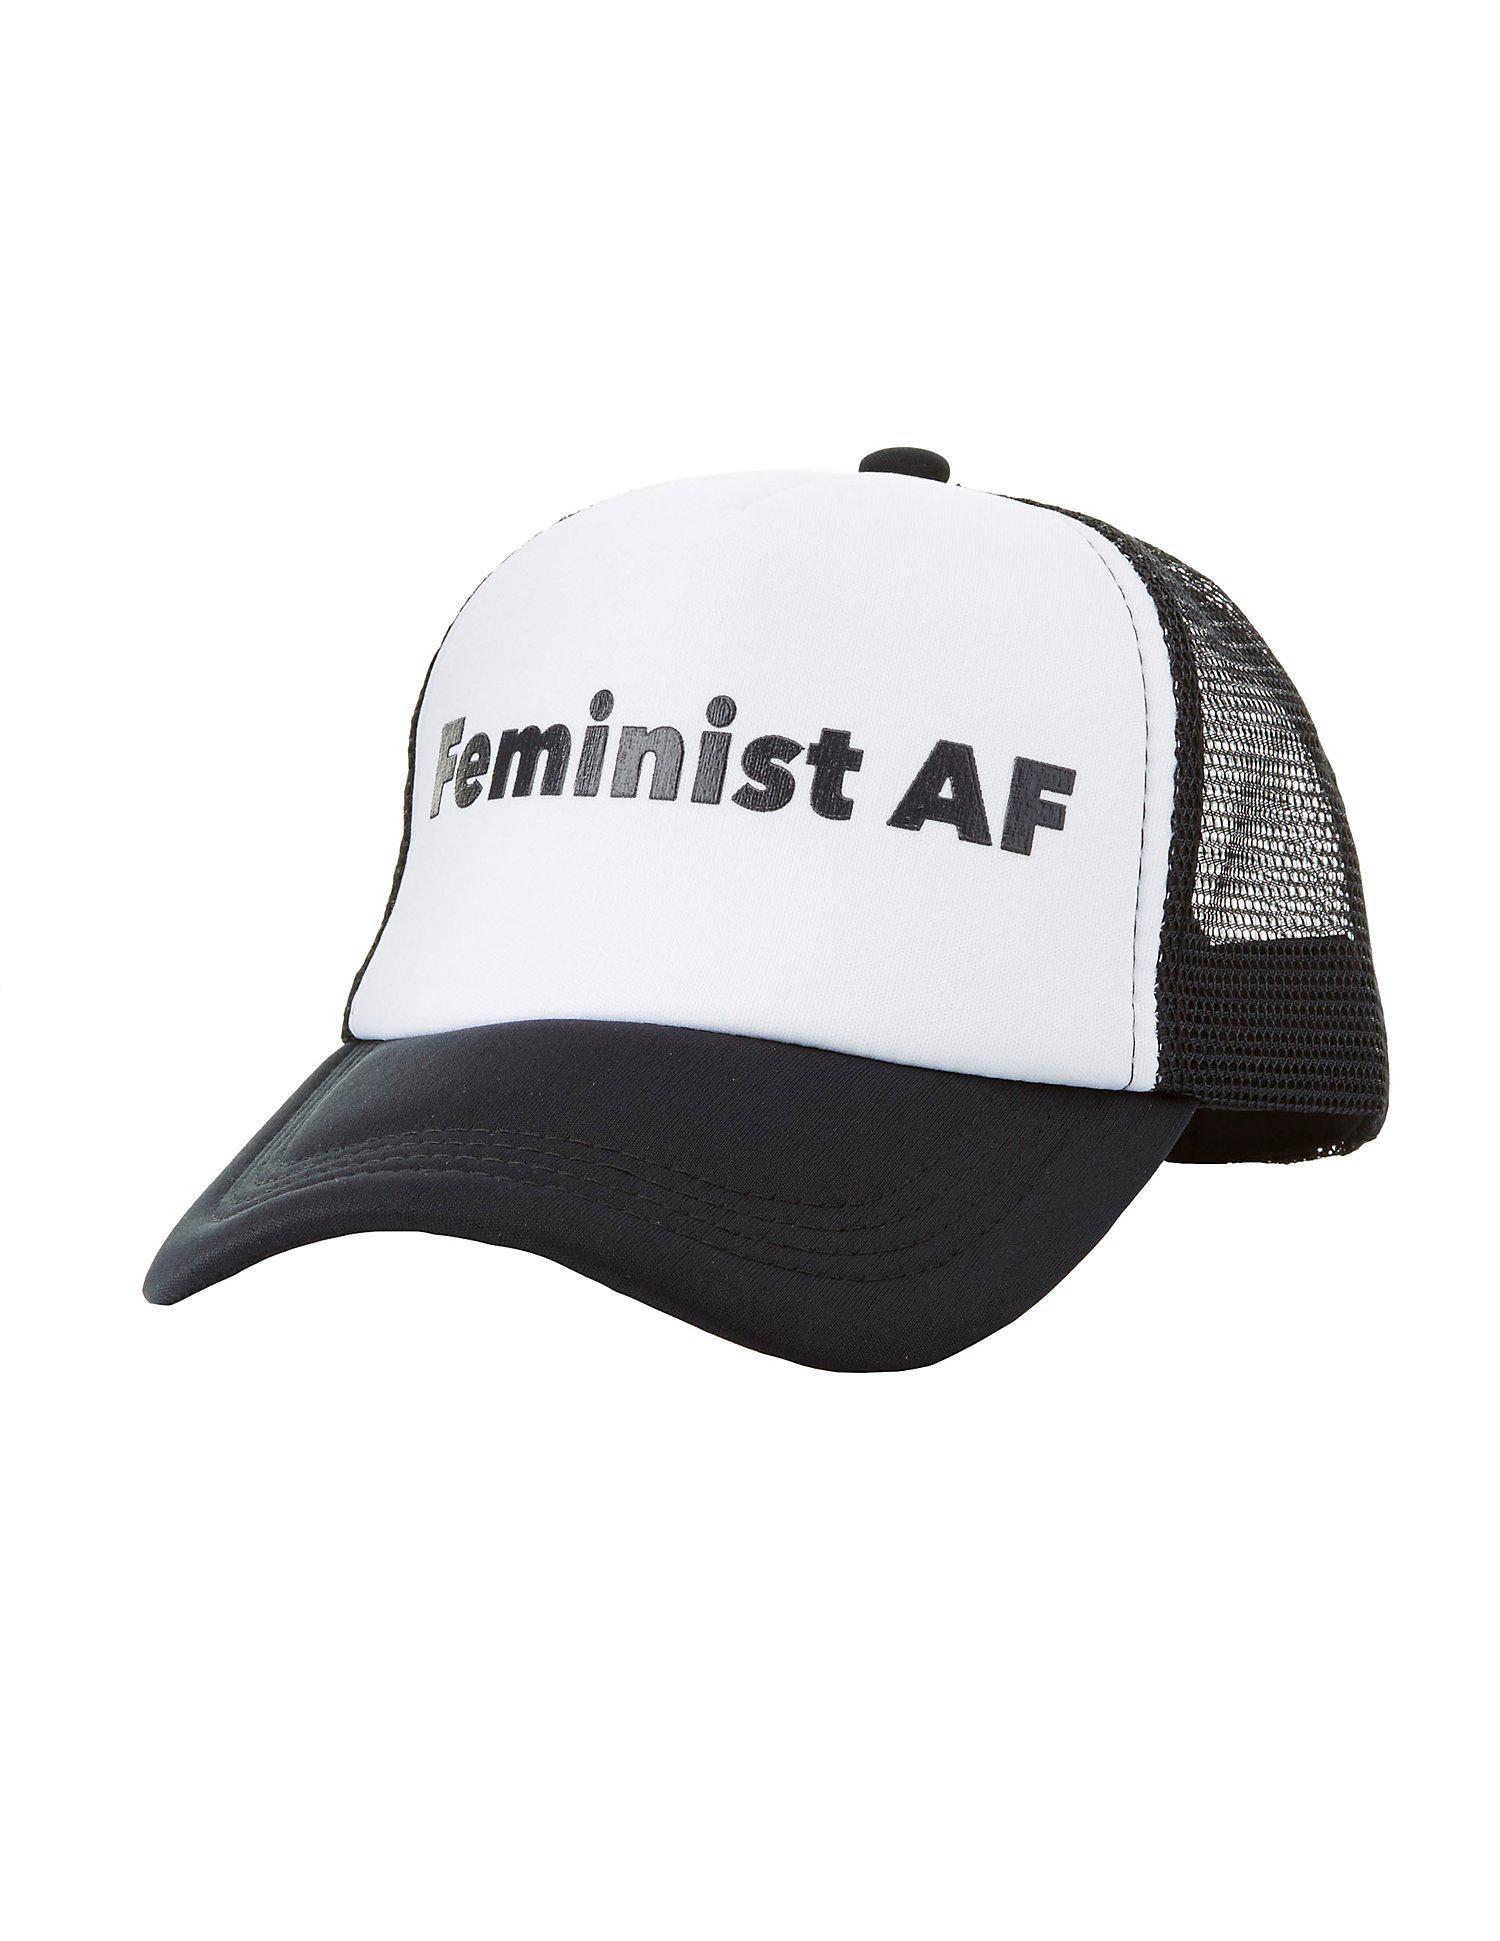 a1d5b42d668246 Lyst - Charlotte Russe Feminist Af Trucker Hat in Black